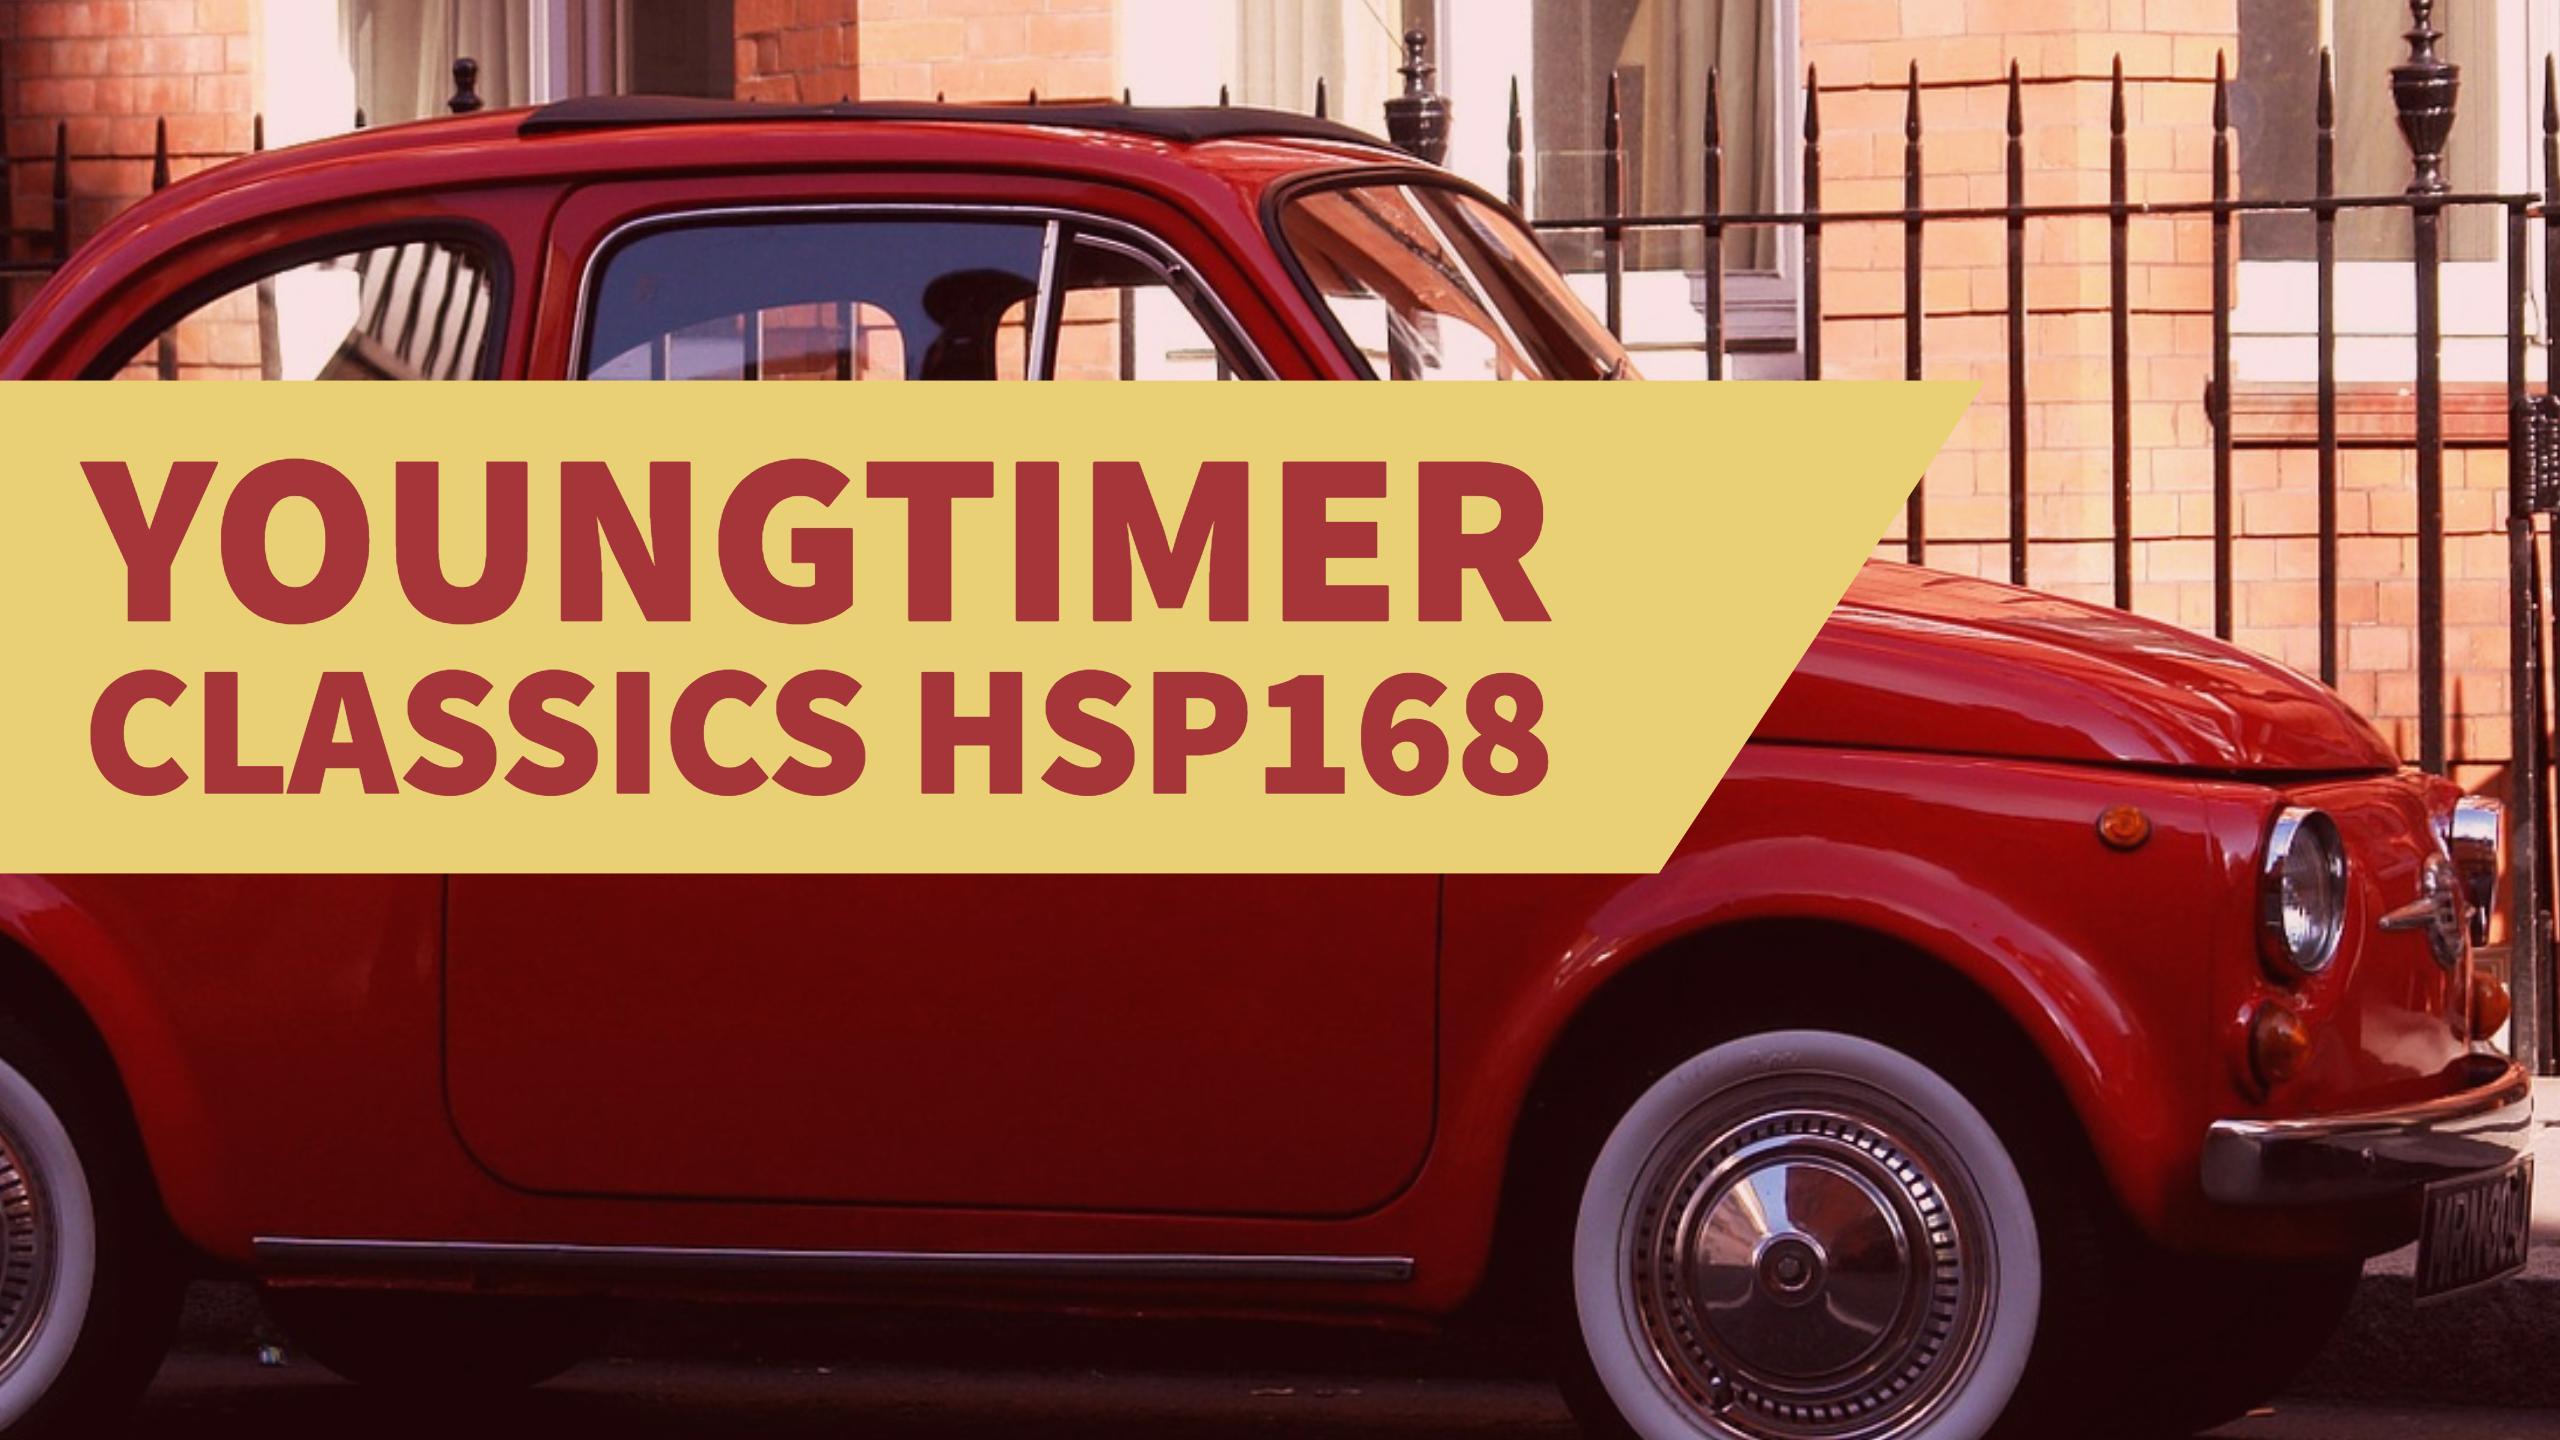 HSP168 Youngtimer mit Black Legend, The Committee und John Cutler